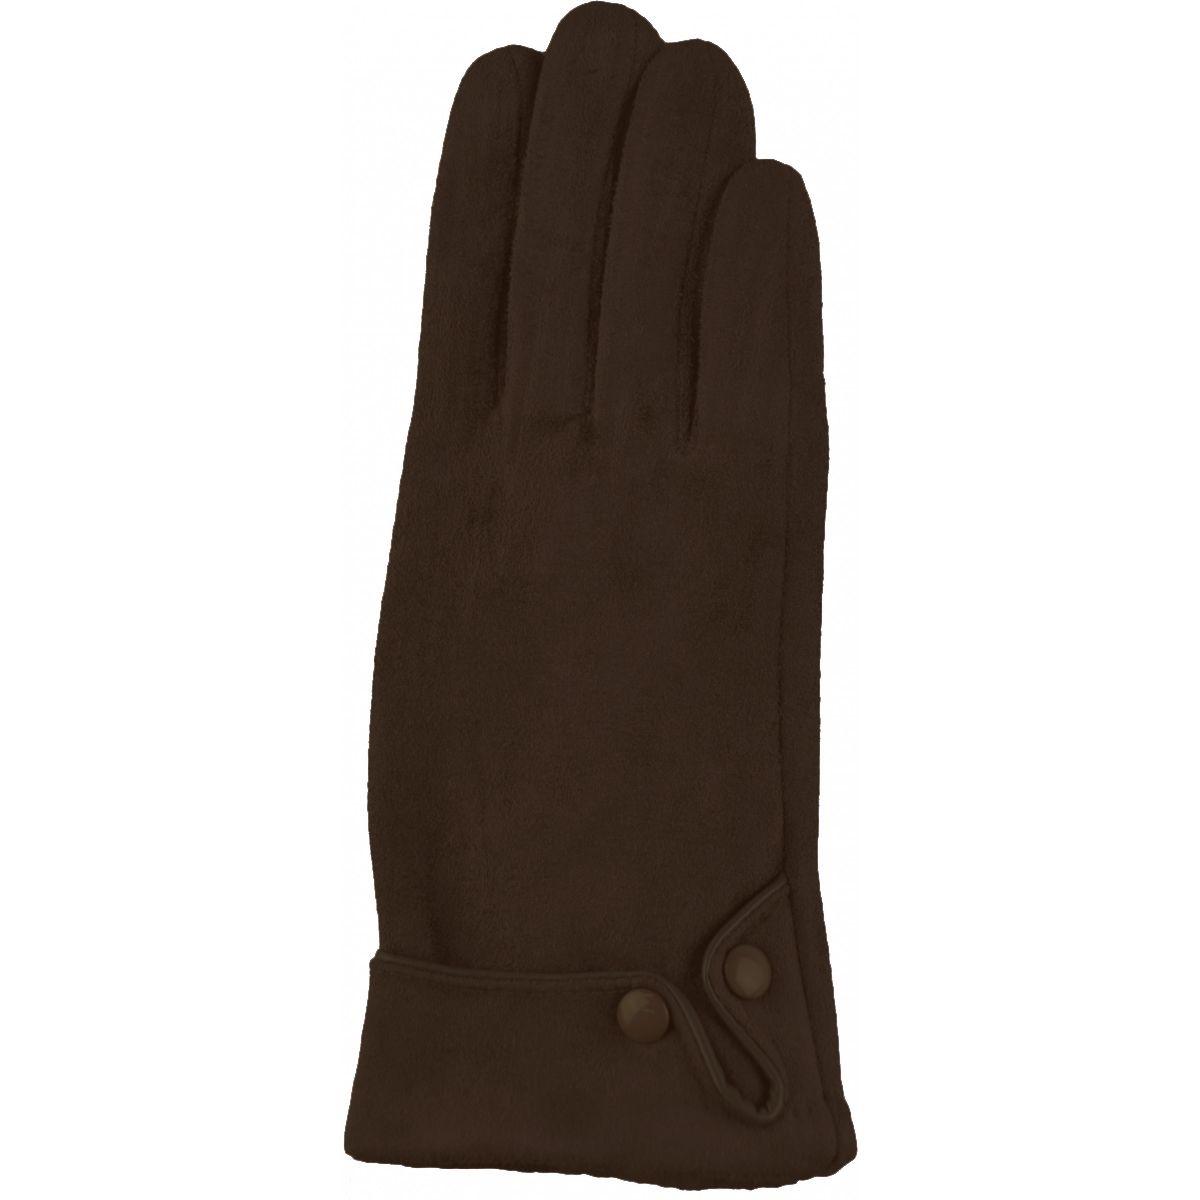 eae2599ch_gants-pin-up-retro-vintage-glamour-40-s-50-s-edith-chocolat